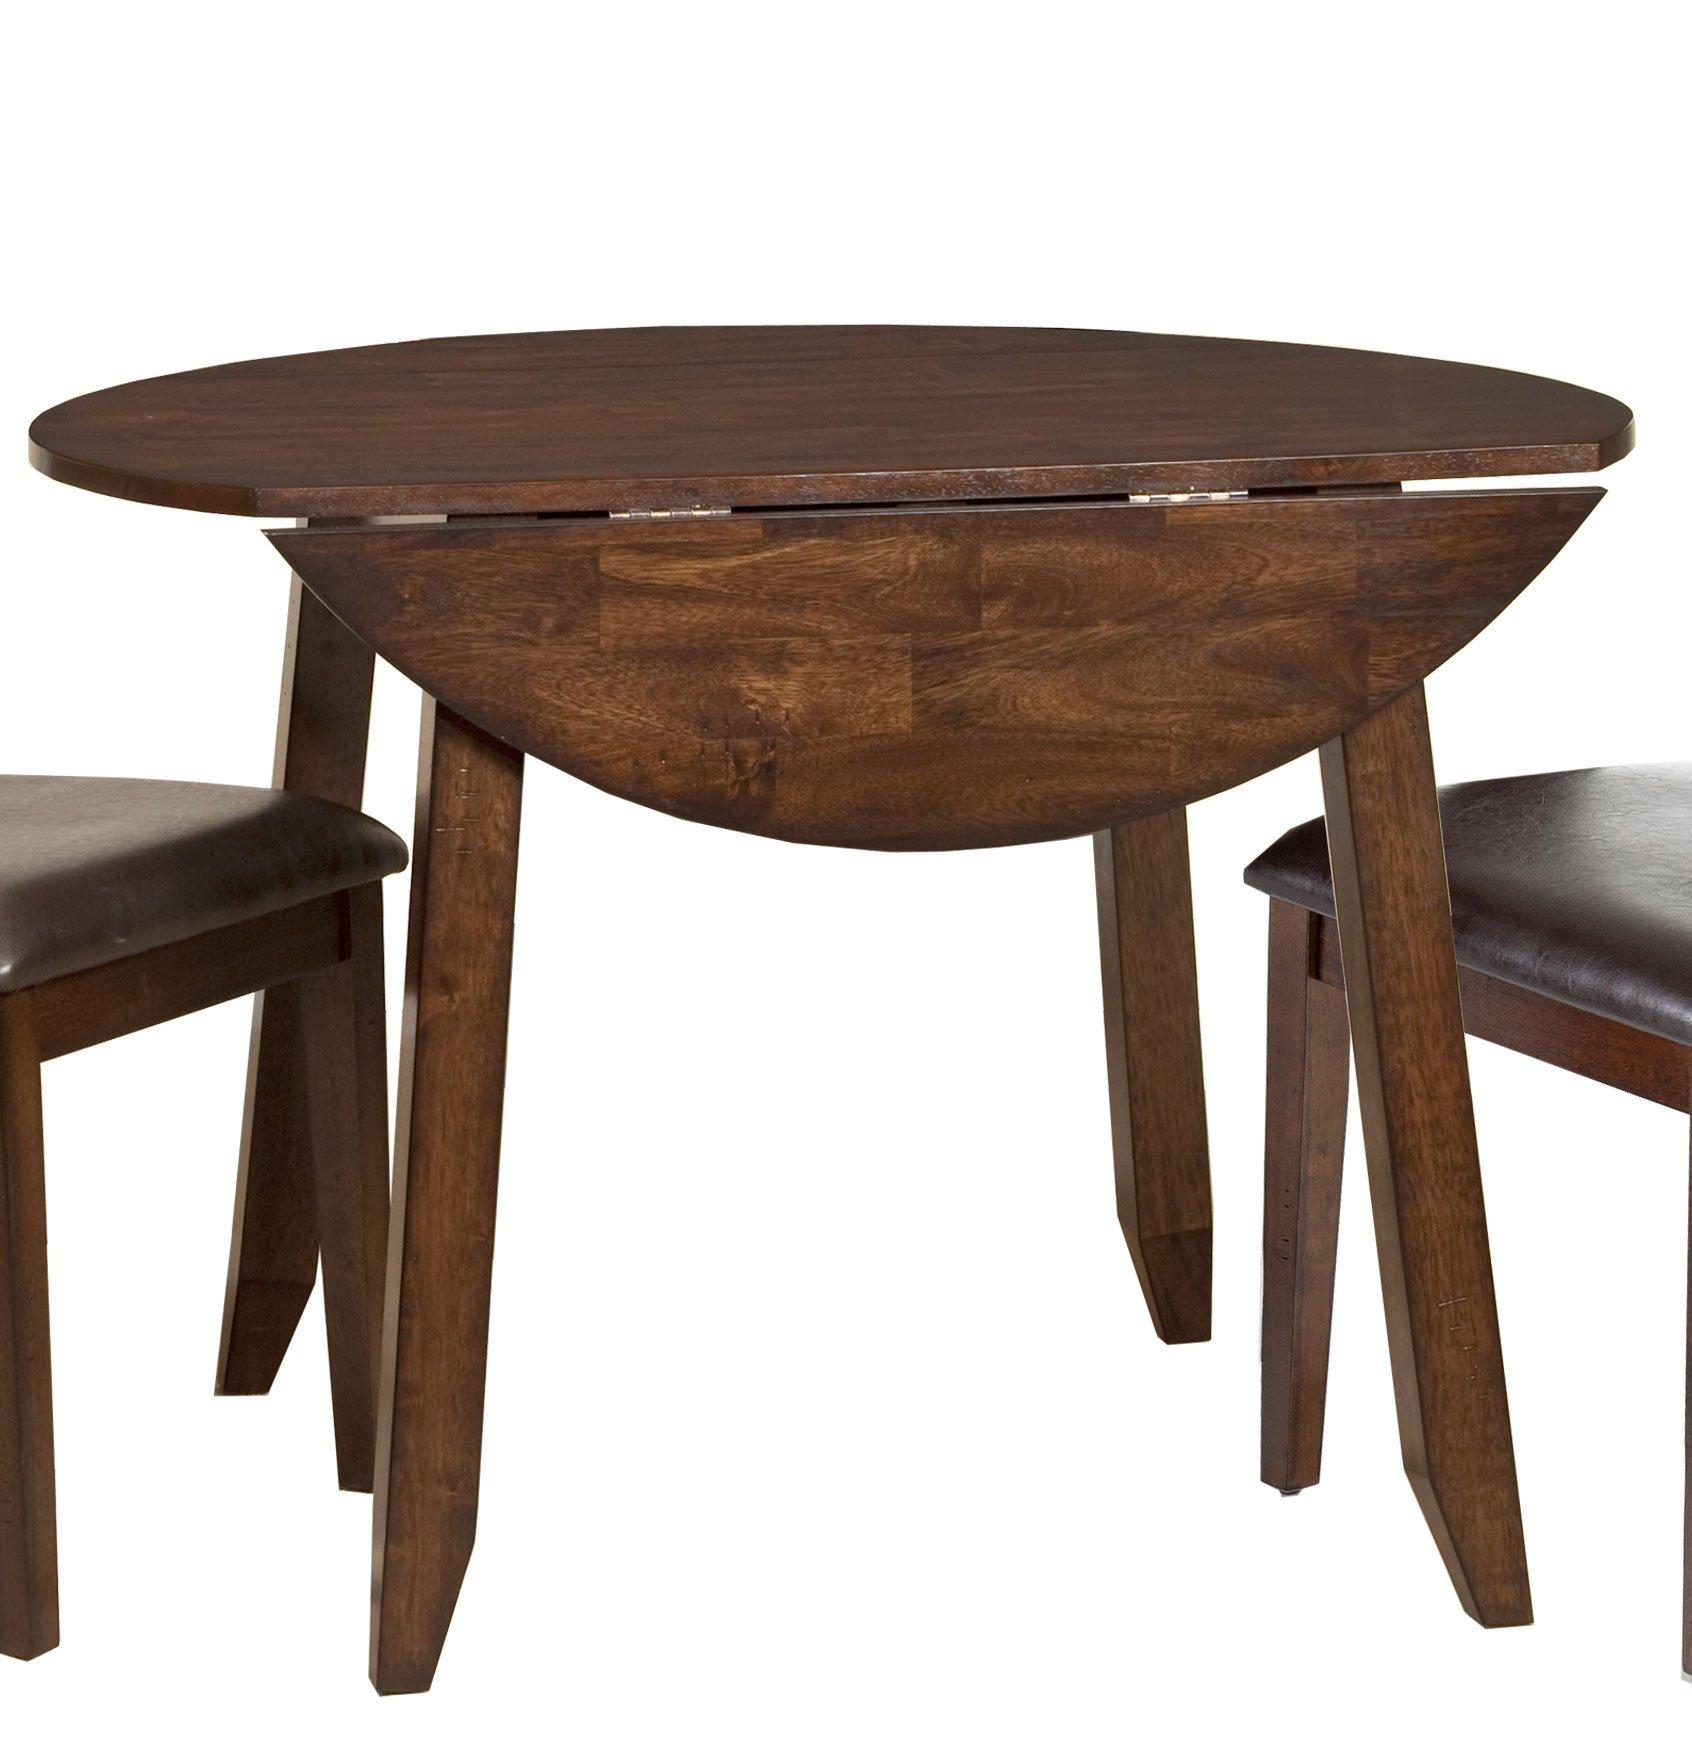 Raisin 3 Piece Round Dining Set Kona Rc Willey Furniture Store